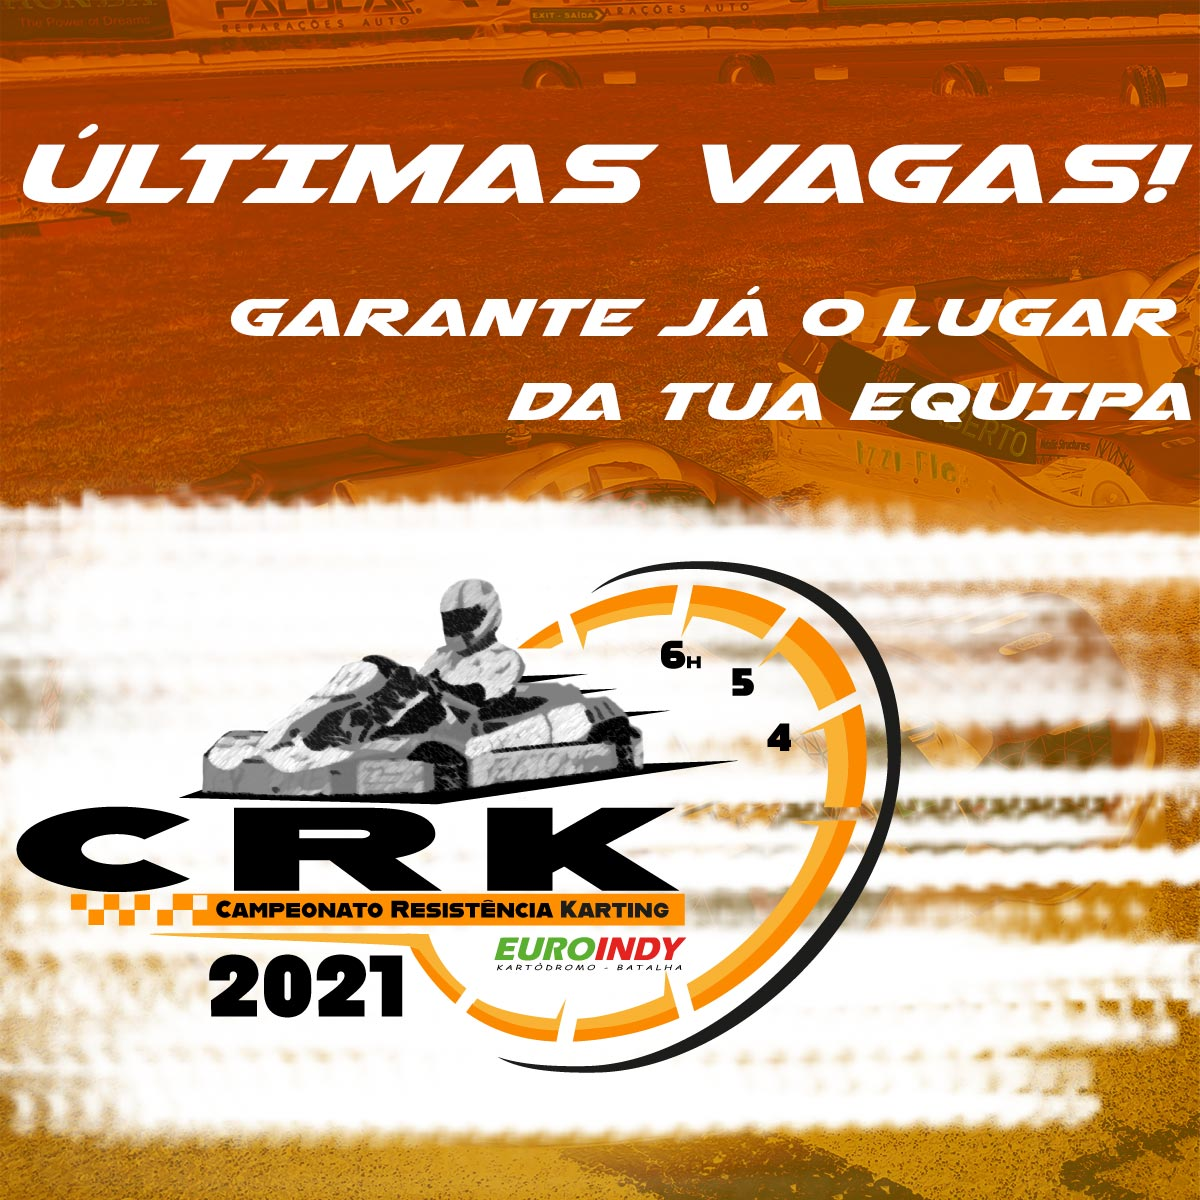 CRK - Campeonato Resistência Karting 2021